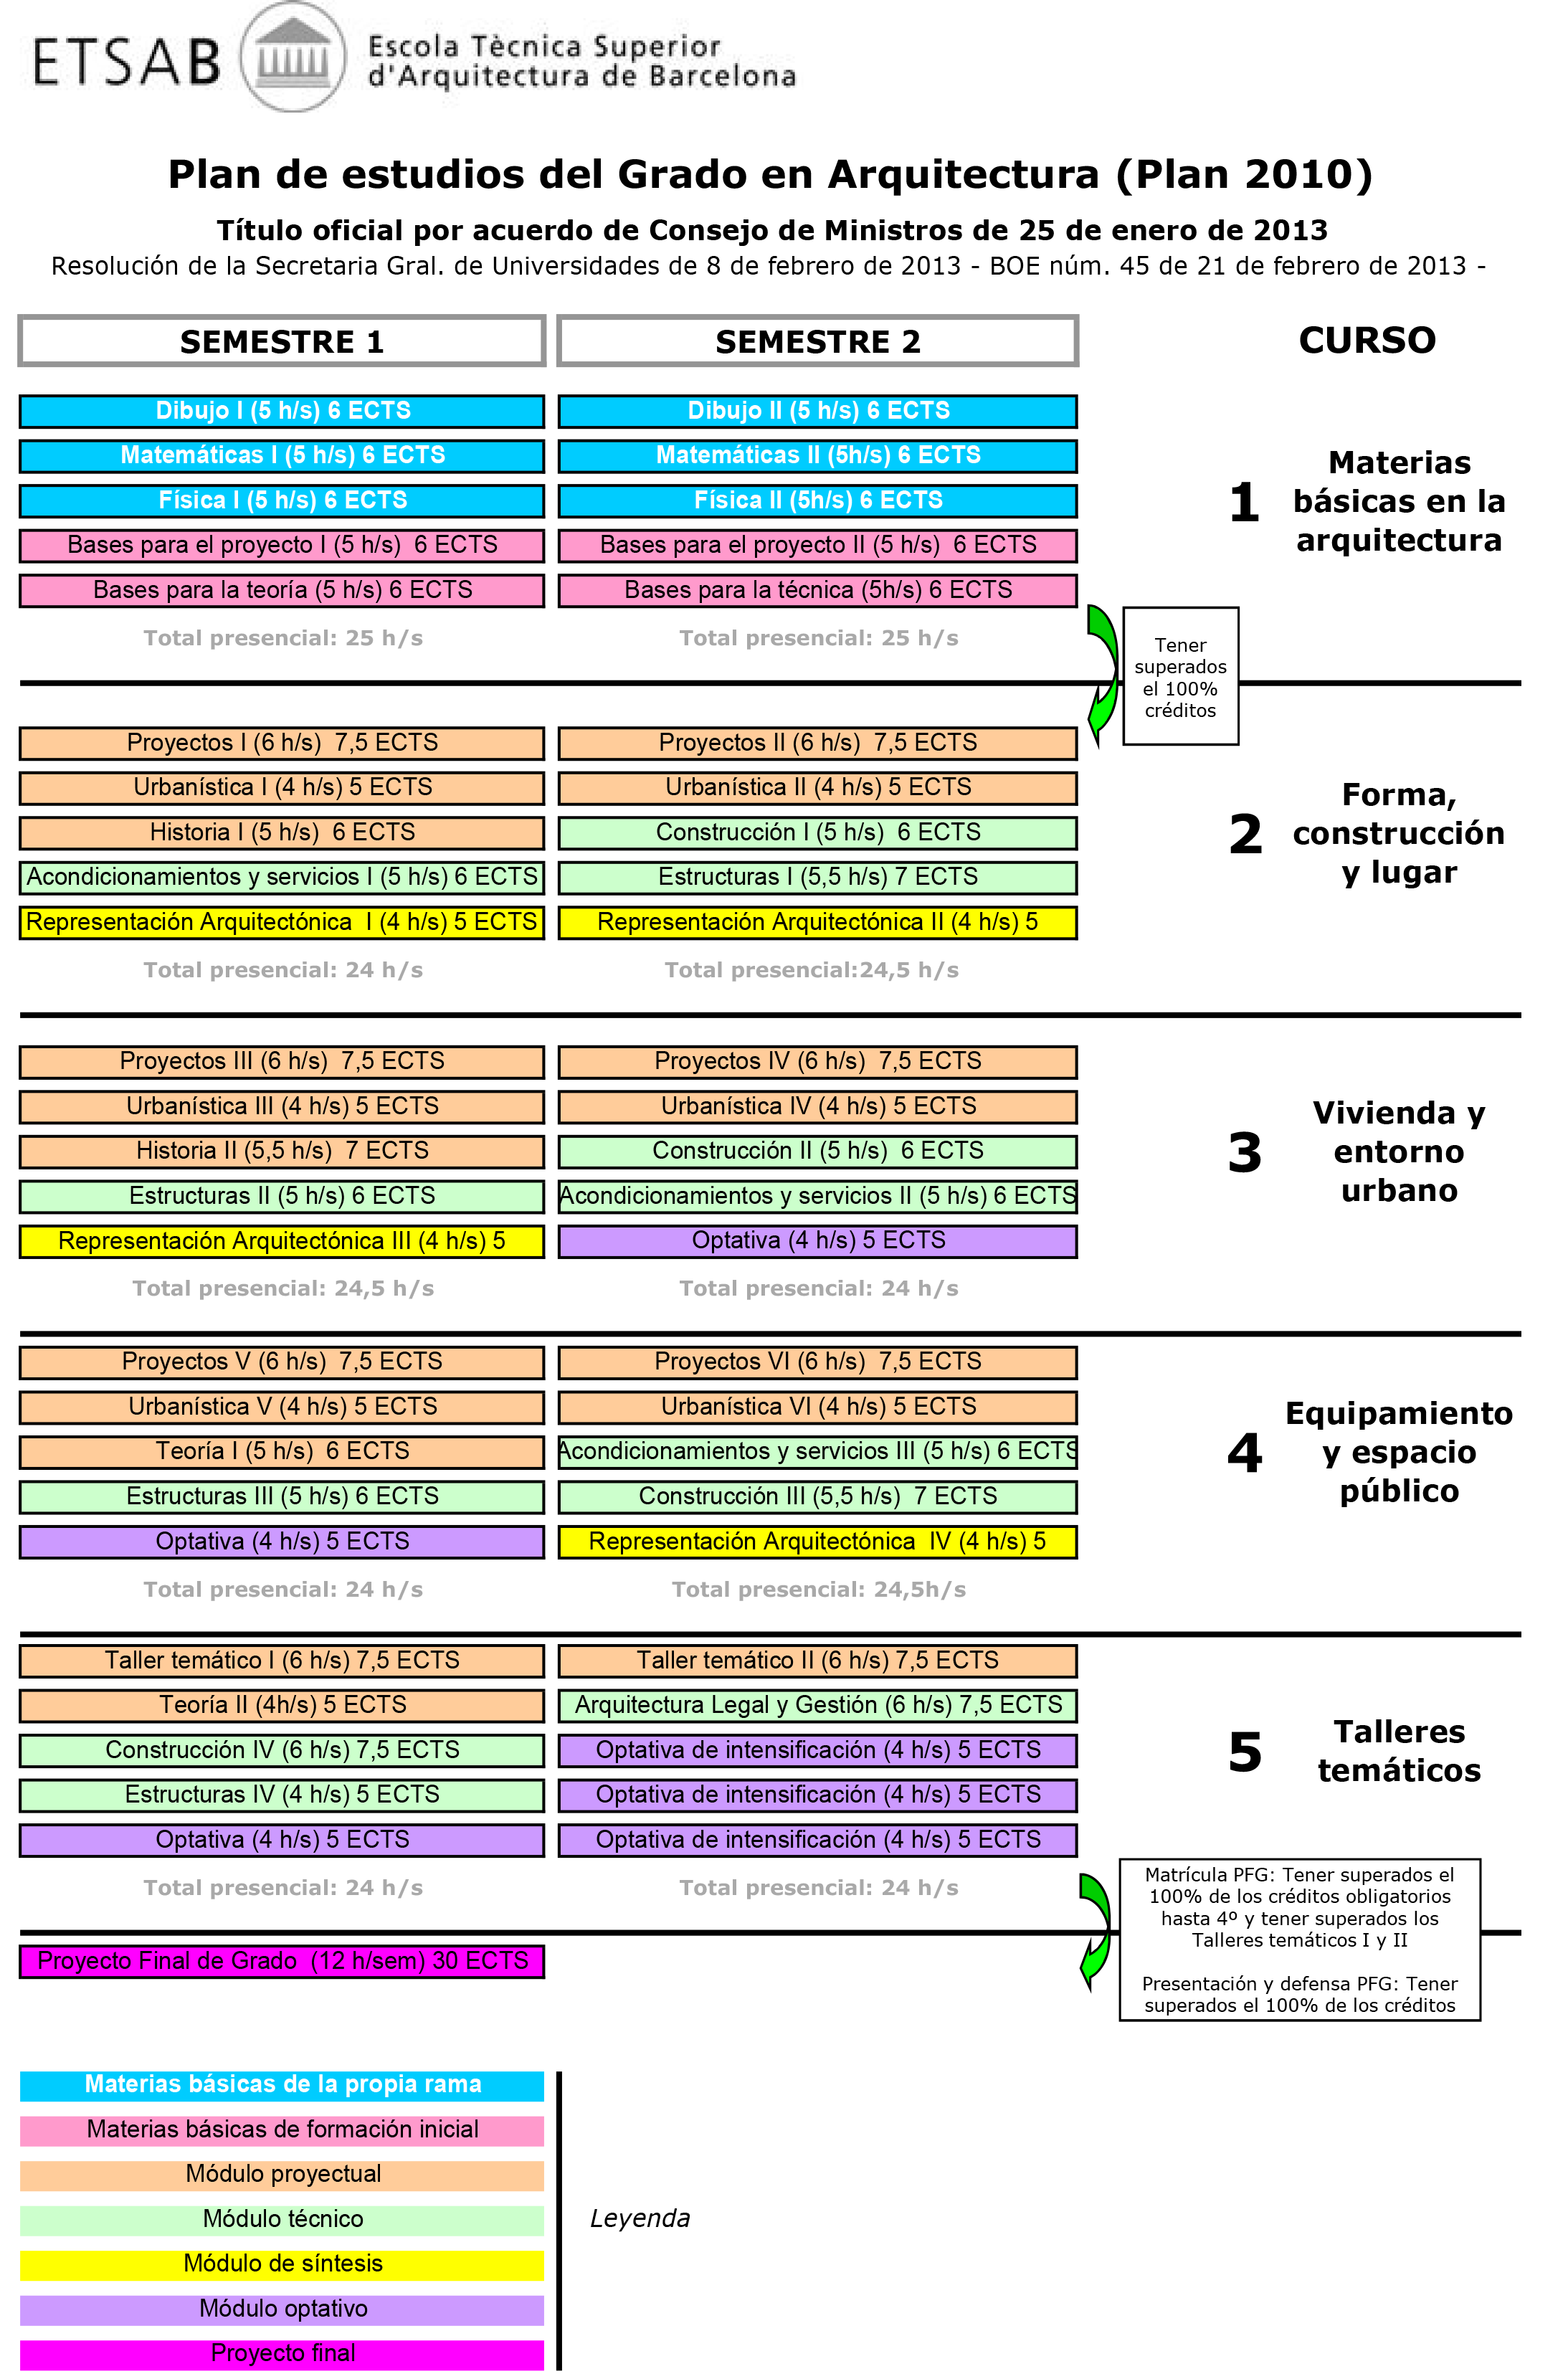 Plan de estudios etsab escuela t cnica superior de for Grado superior arquitectura